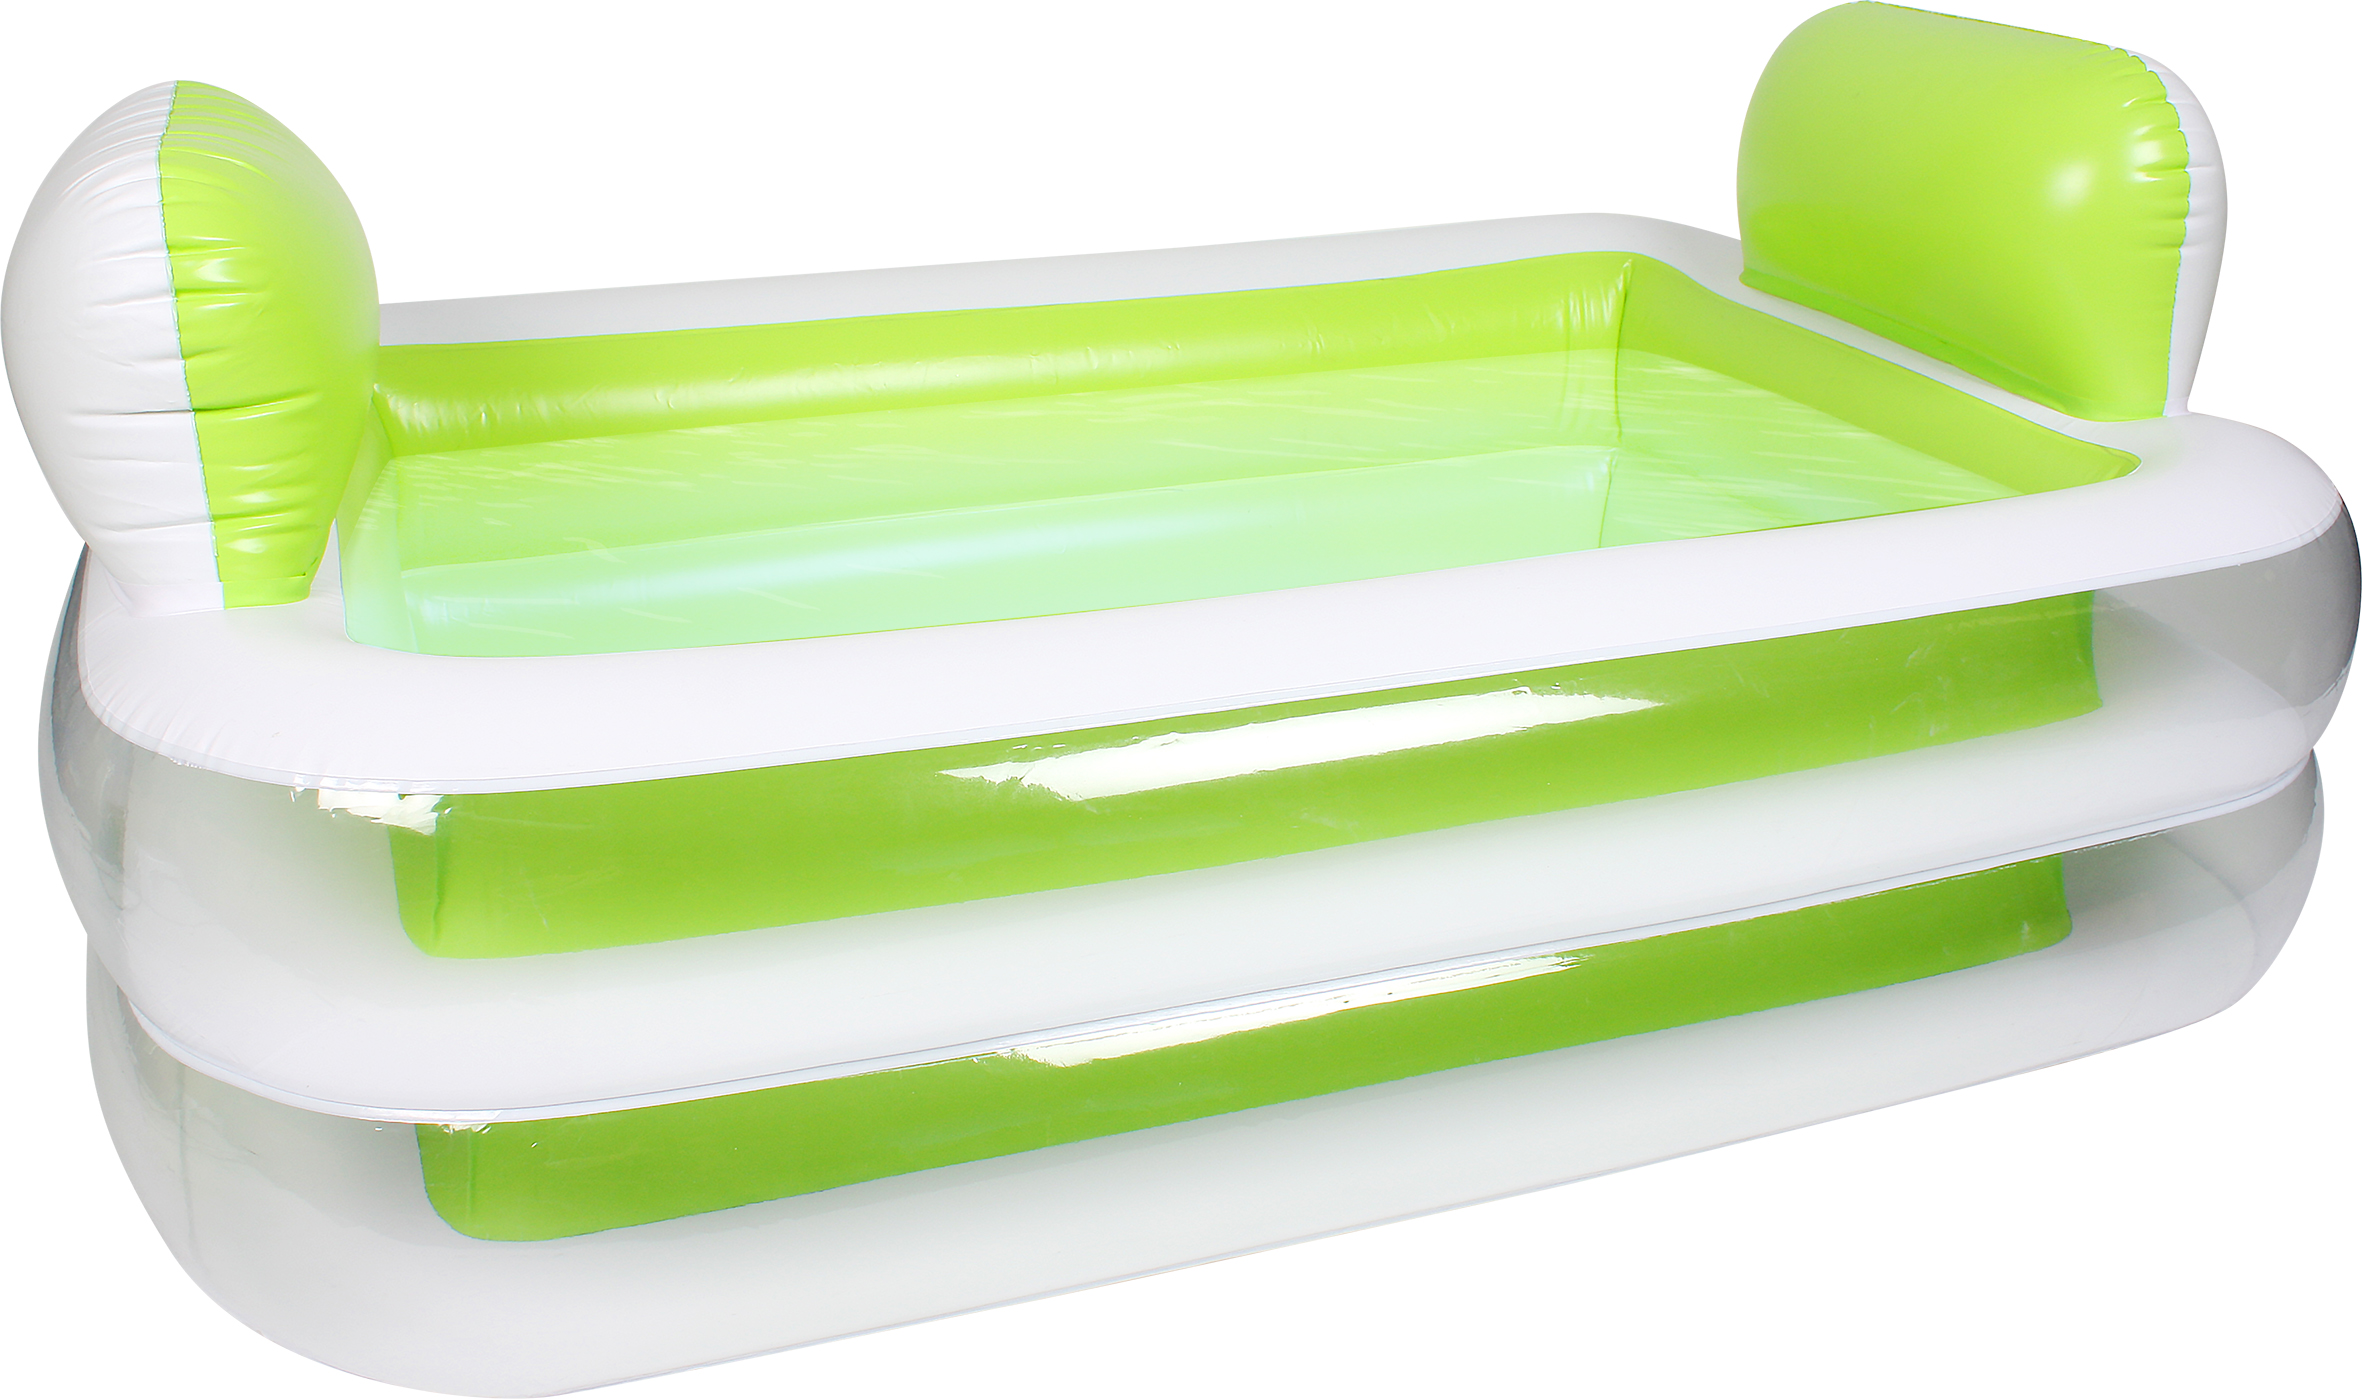 Inflatable family swimming pool rectangular pillows for Inflatable family swimming pool